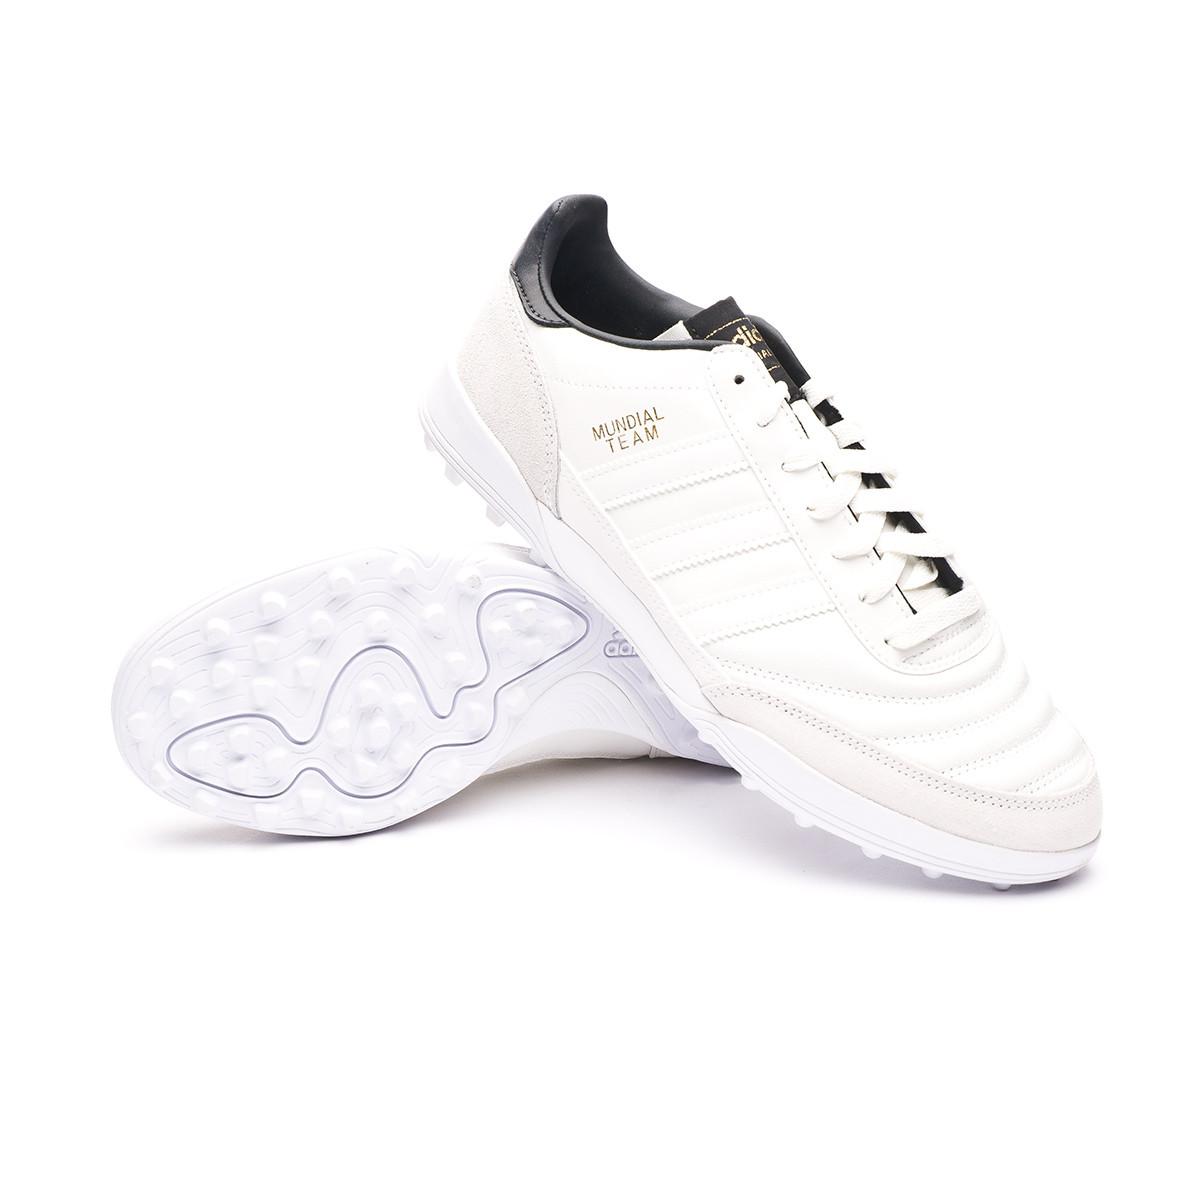 adidas Mundial Team Turf Football Boots